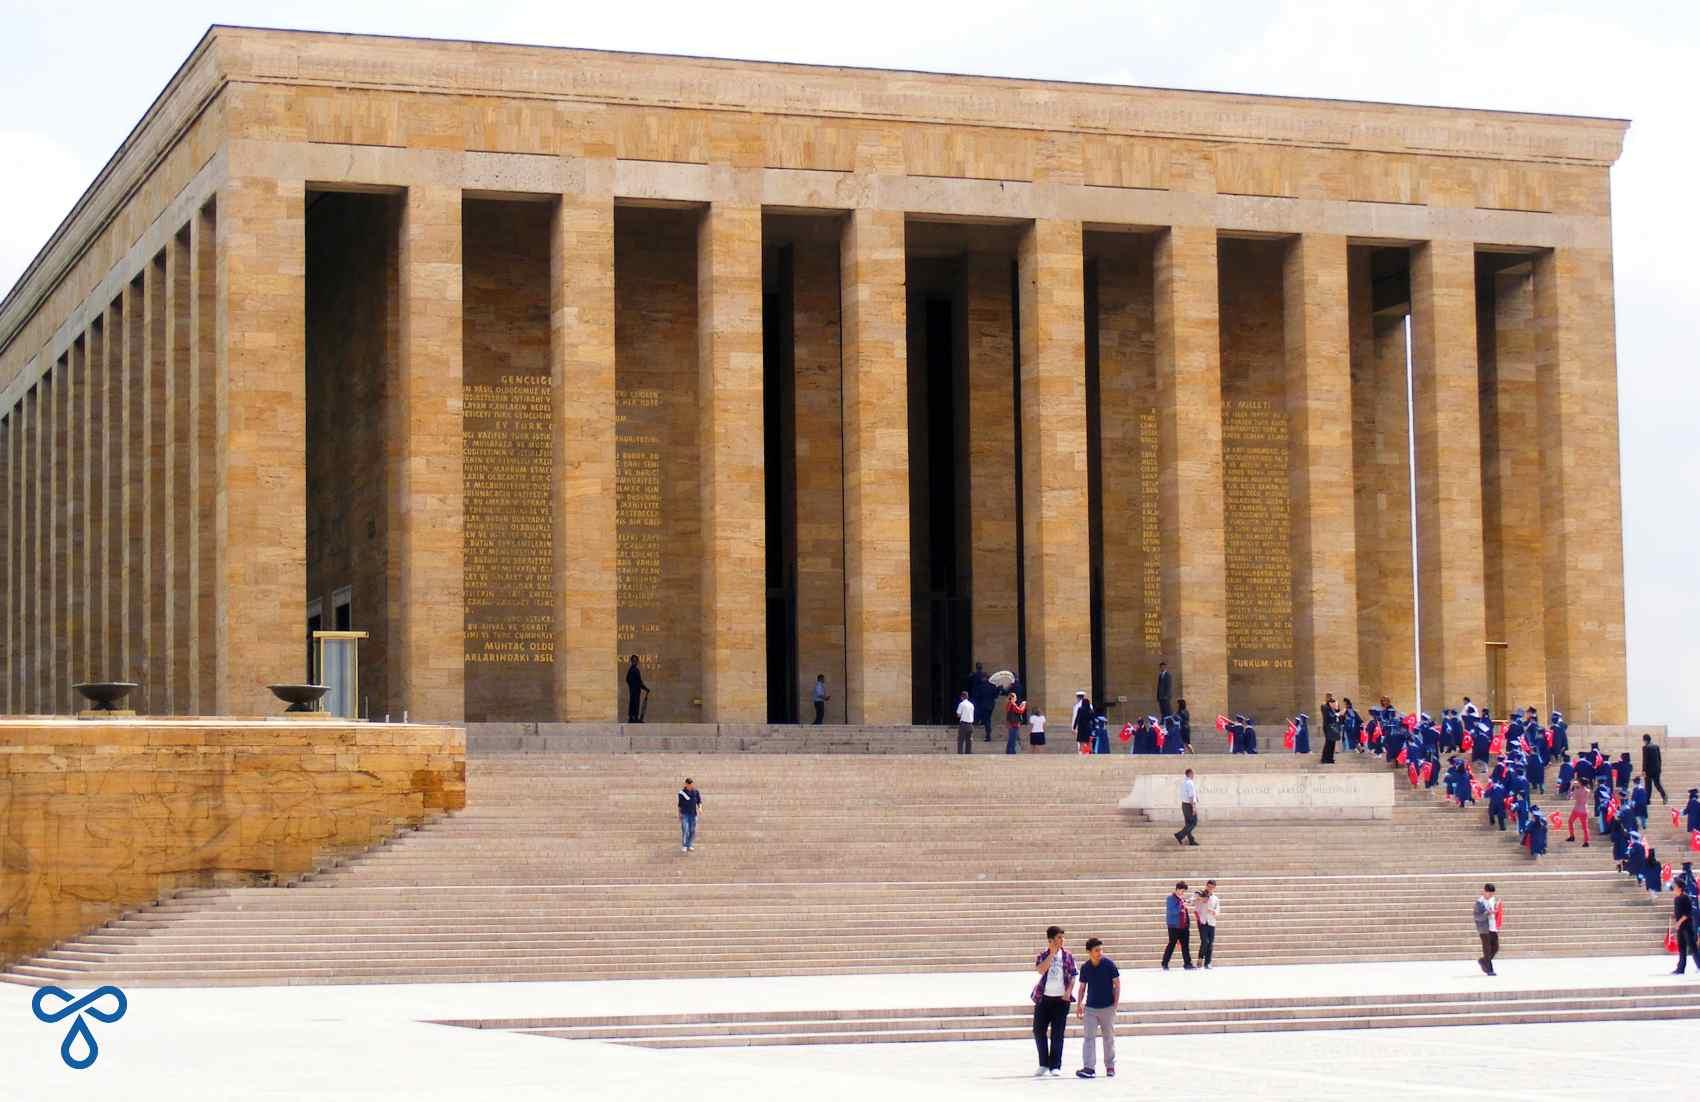 Atatürk's Mausoleum, Ankara